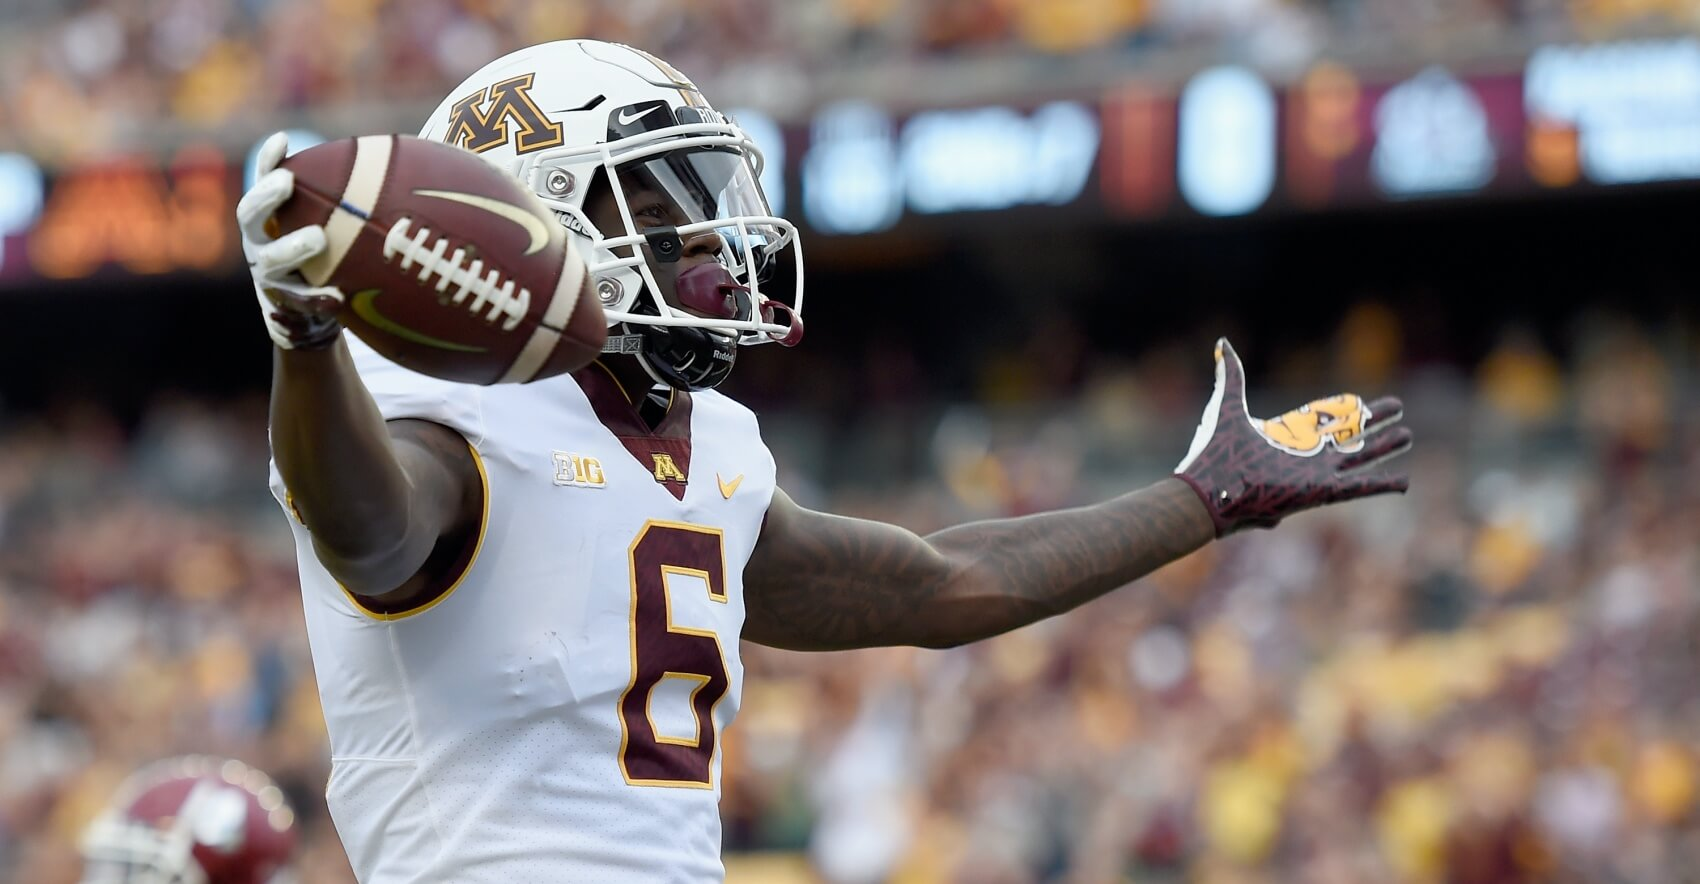 2020 NFL Draft Rookie WR Landing Spots: Rounds 5-7 (Fantasy Football)